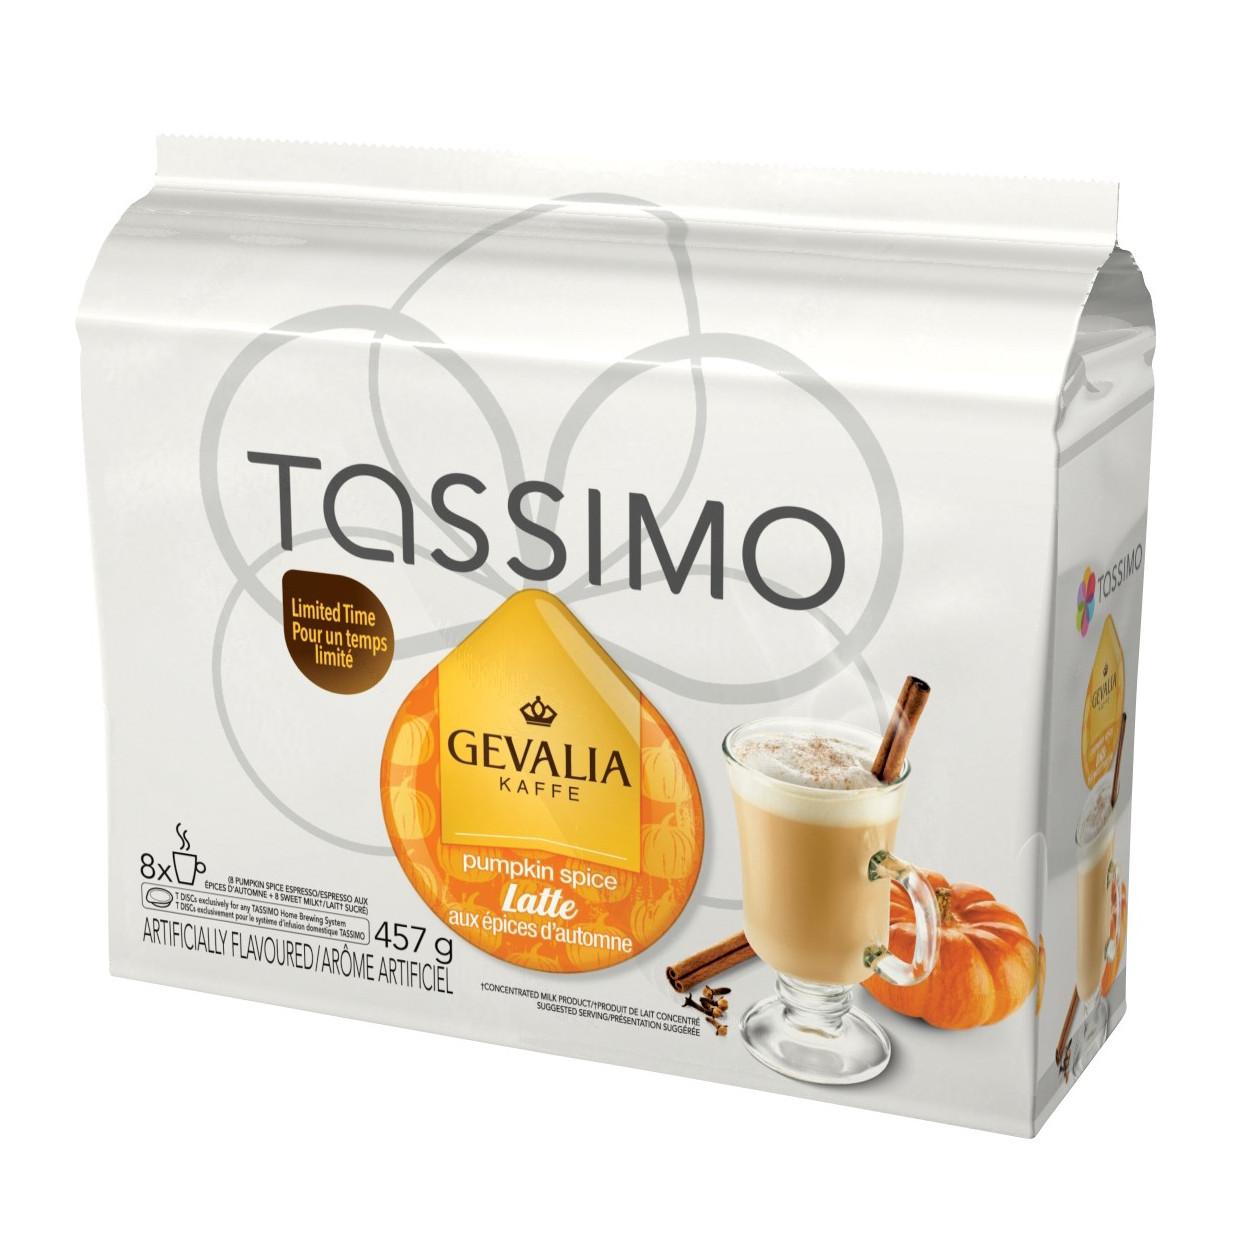 Gevalia Pumpkin Spice Latte (8 pack)